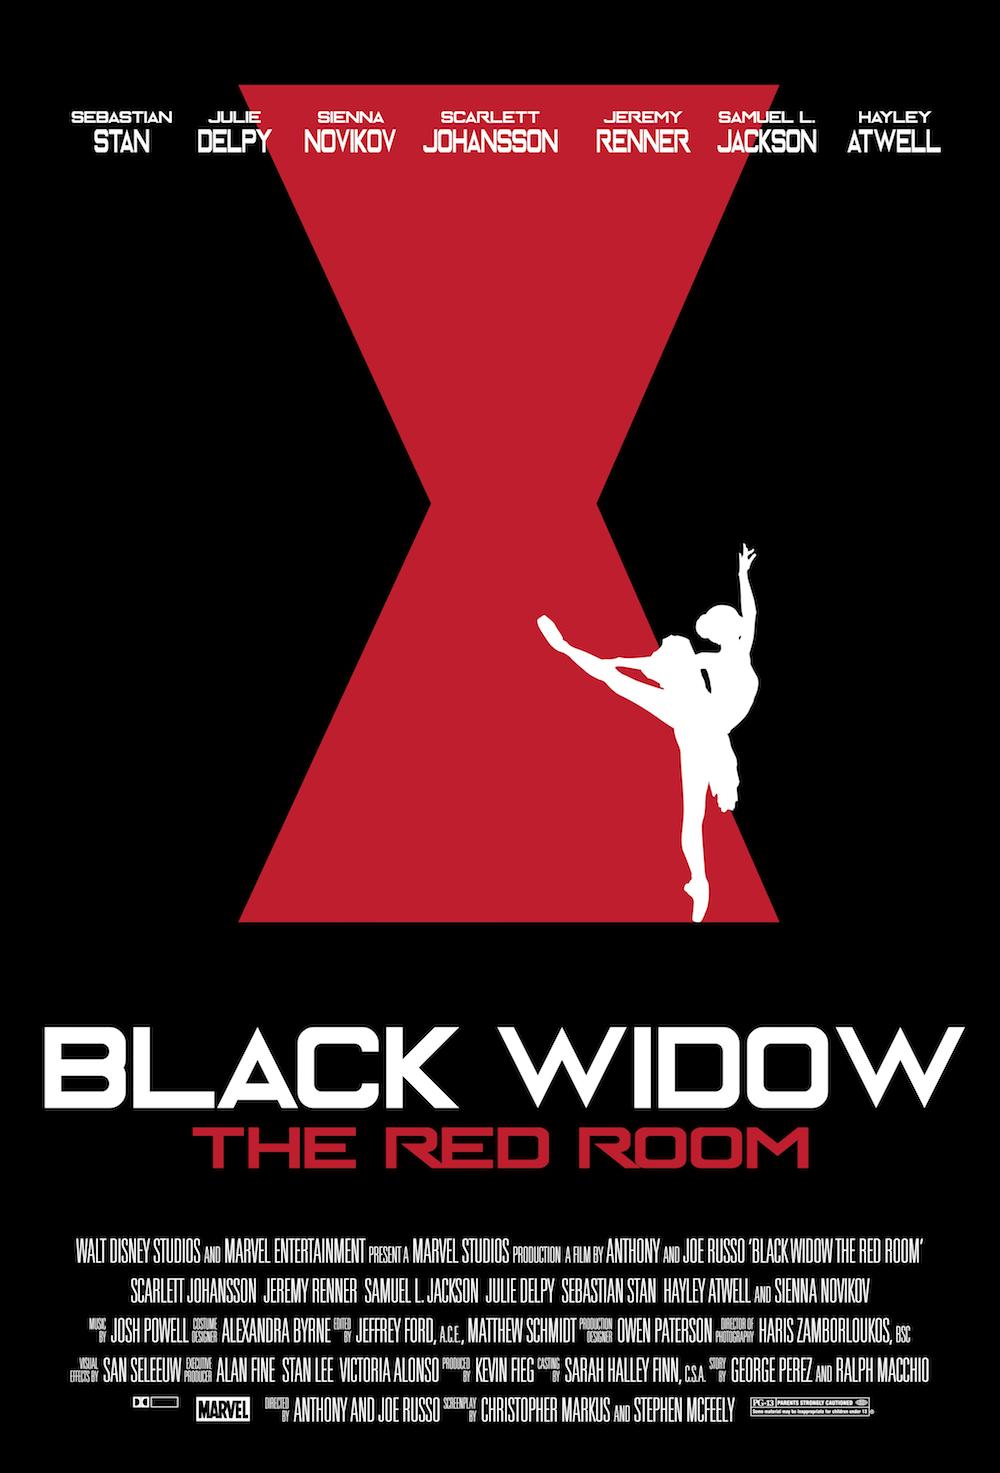 Black Widow The Red Room Fan Art Posters Series